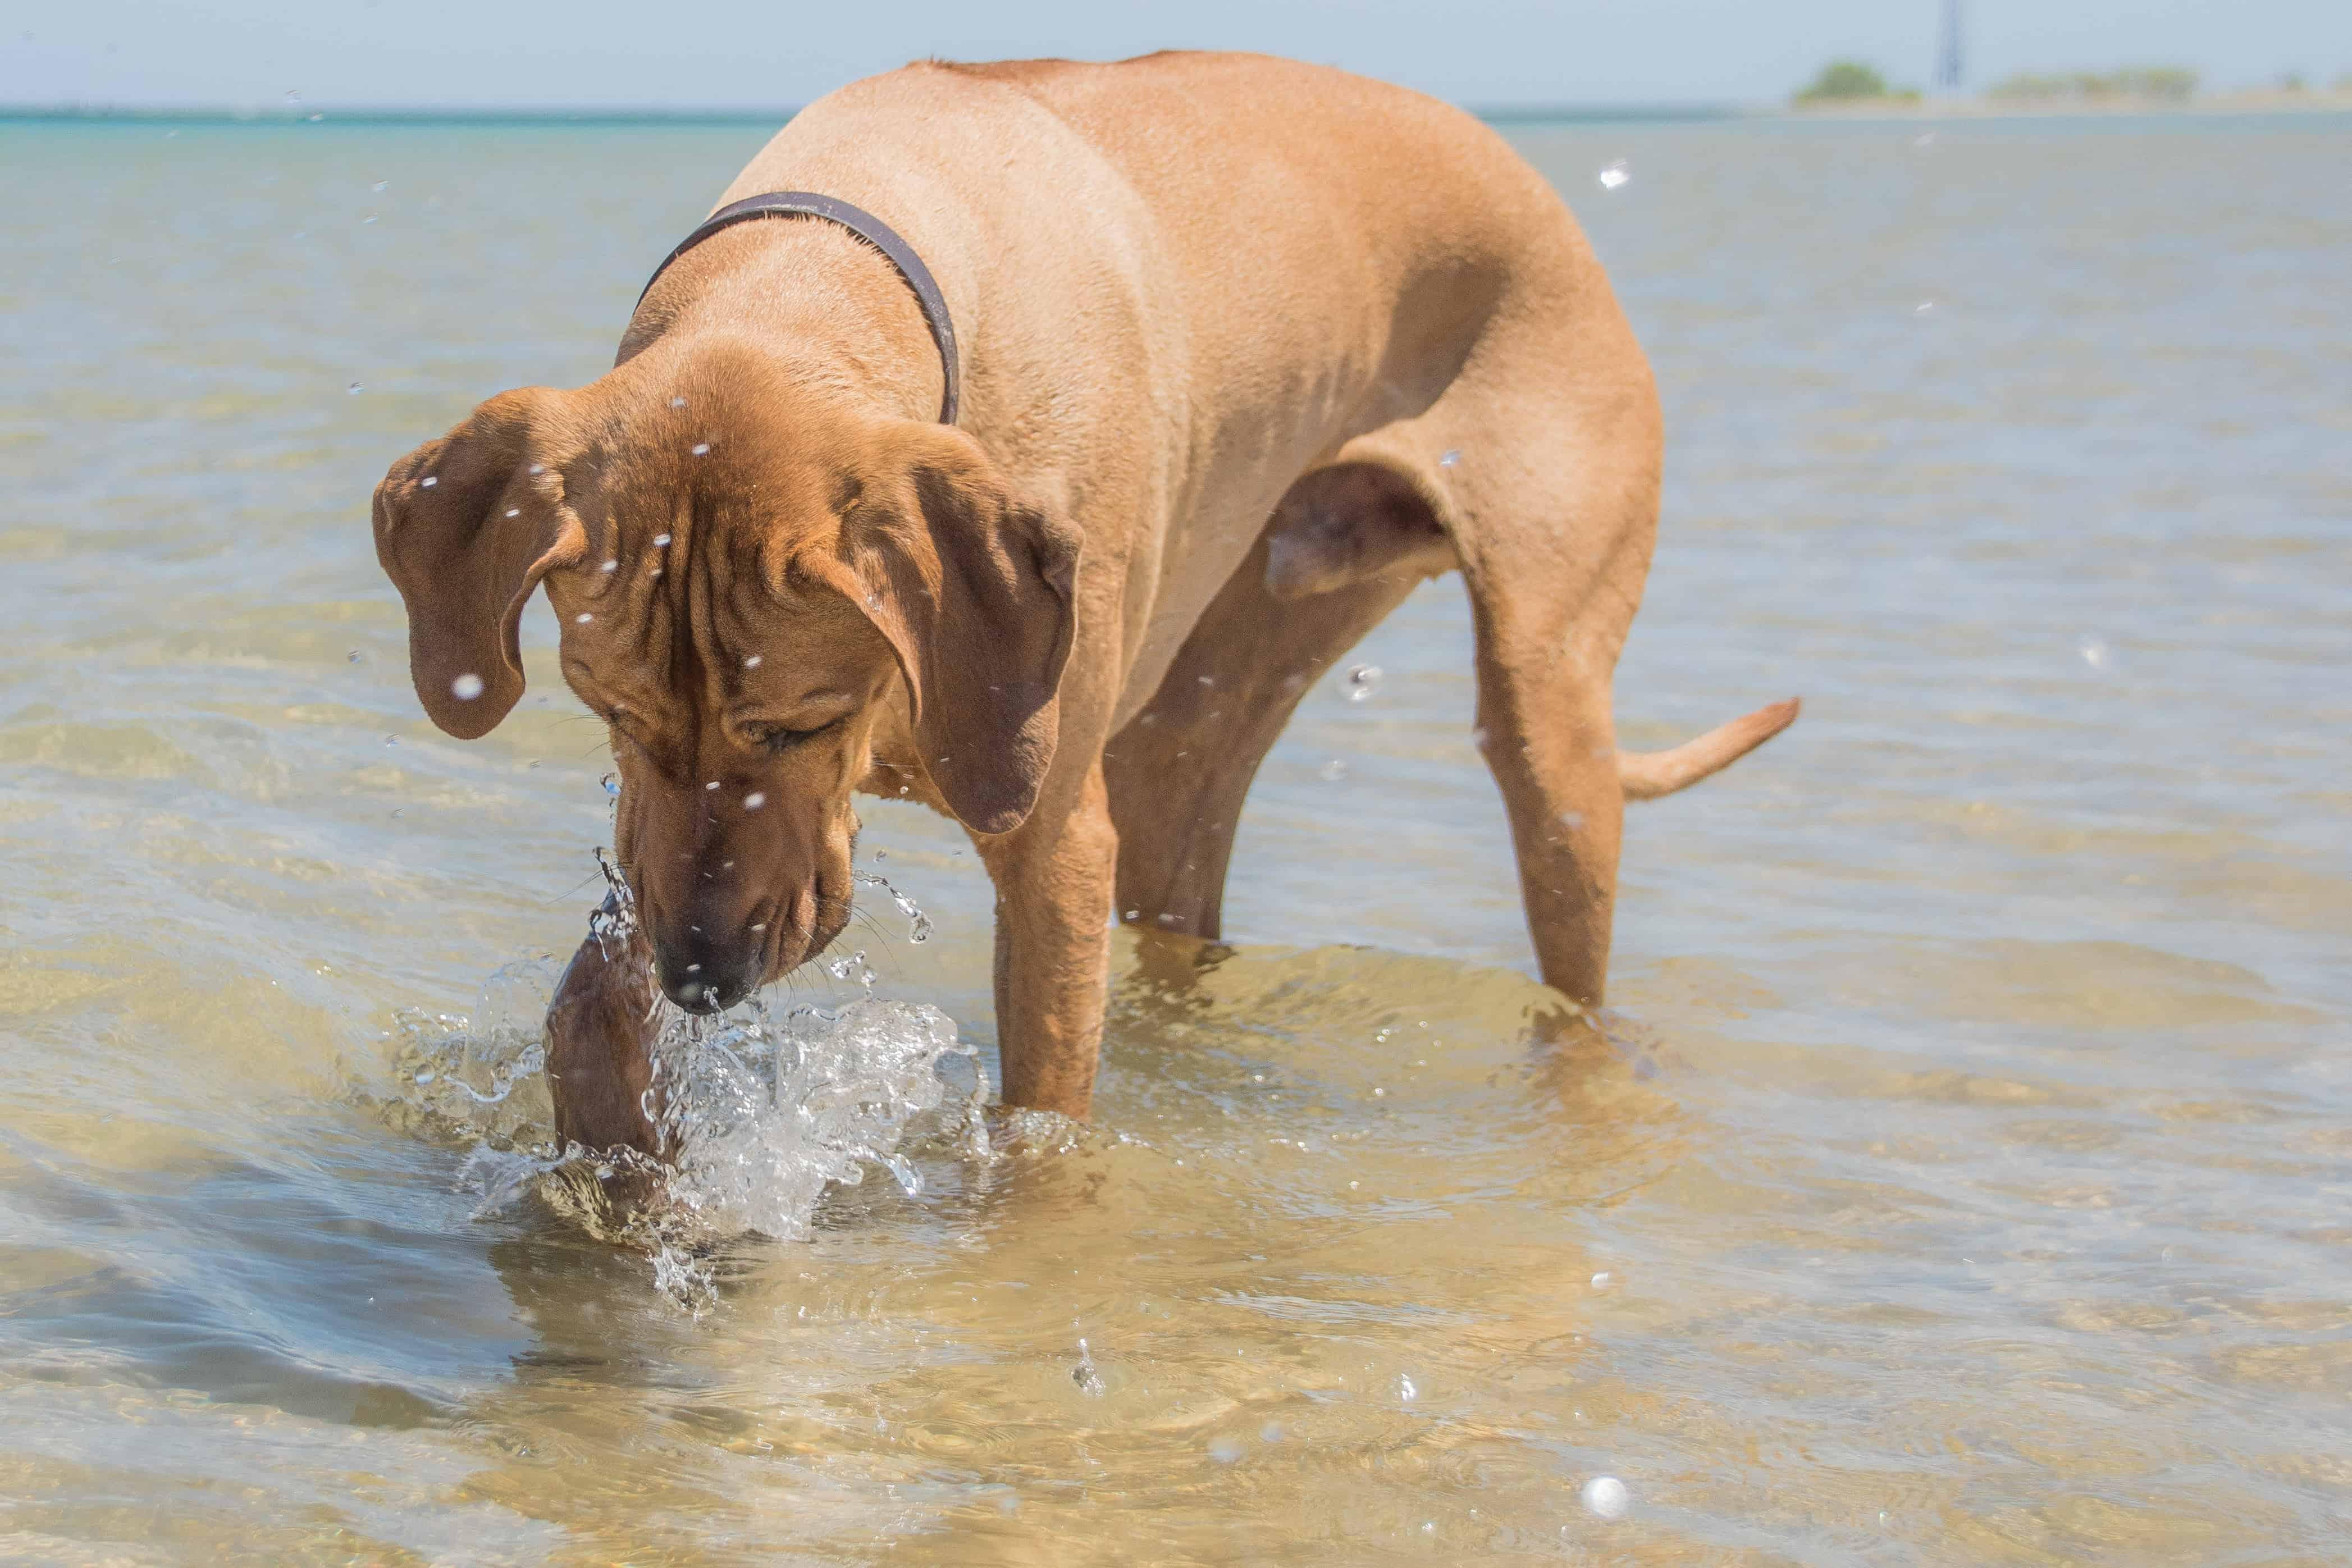 Rhodesian Ridgeback, cute, puppy, chicago, dog beach, adventure